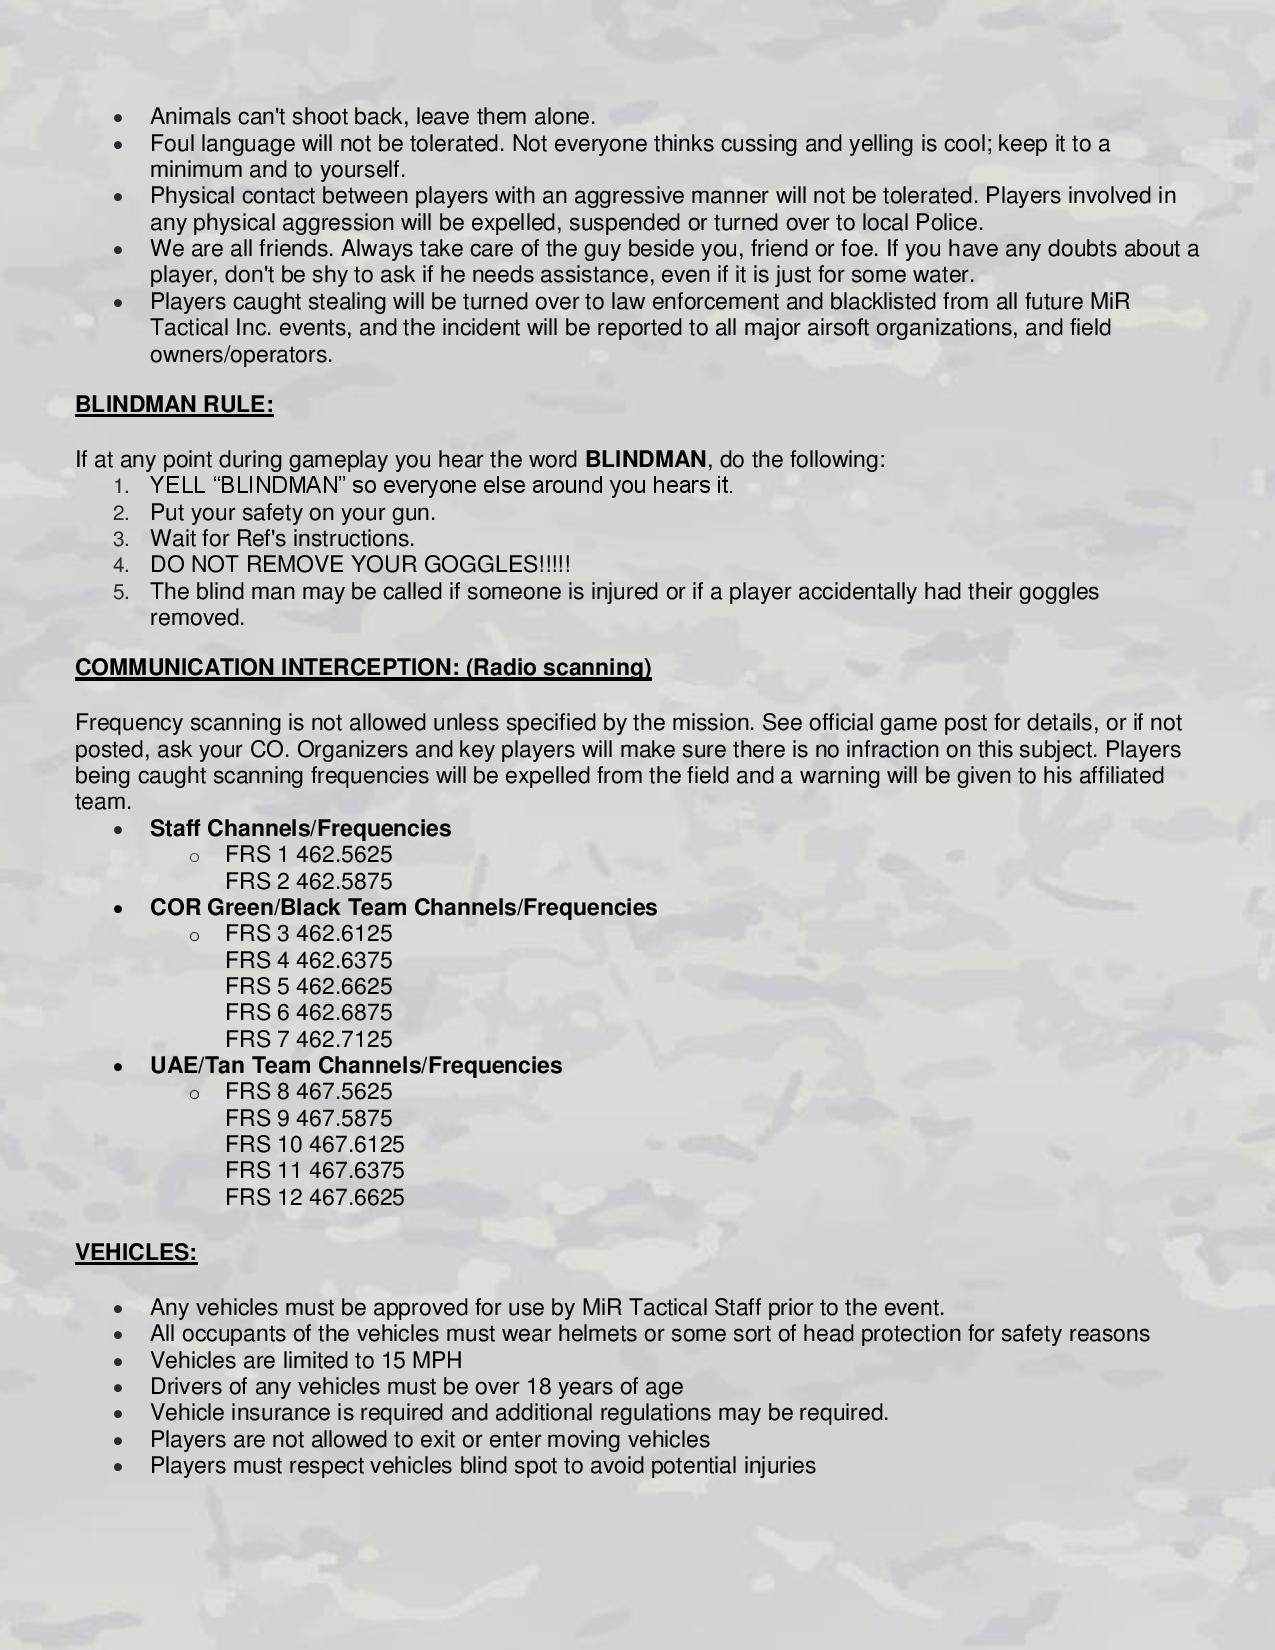 mir-tactical-strikeball-airsoft-sop-v1.1-page-005.jpg